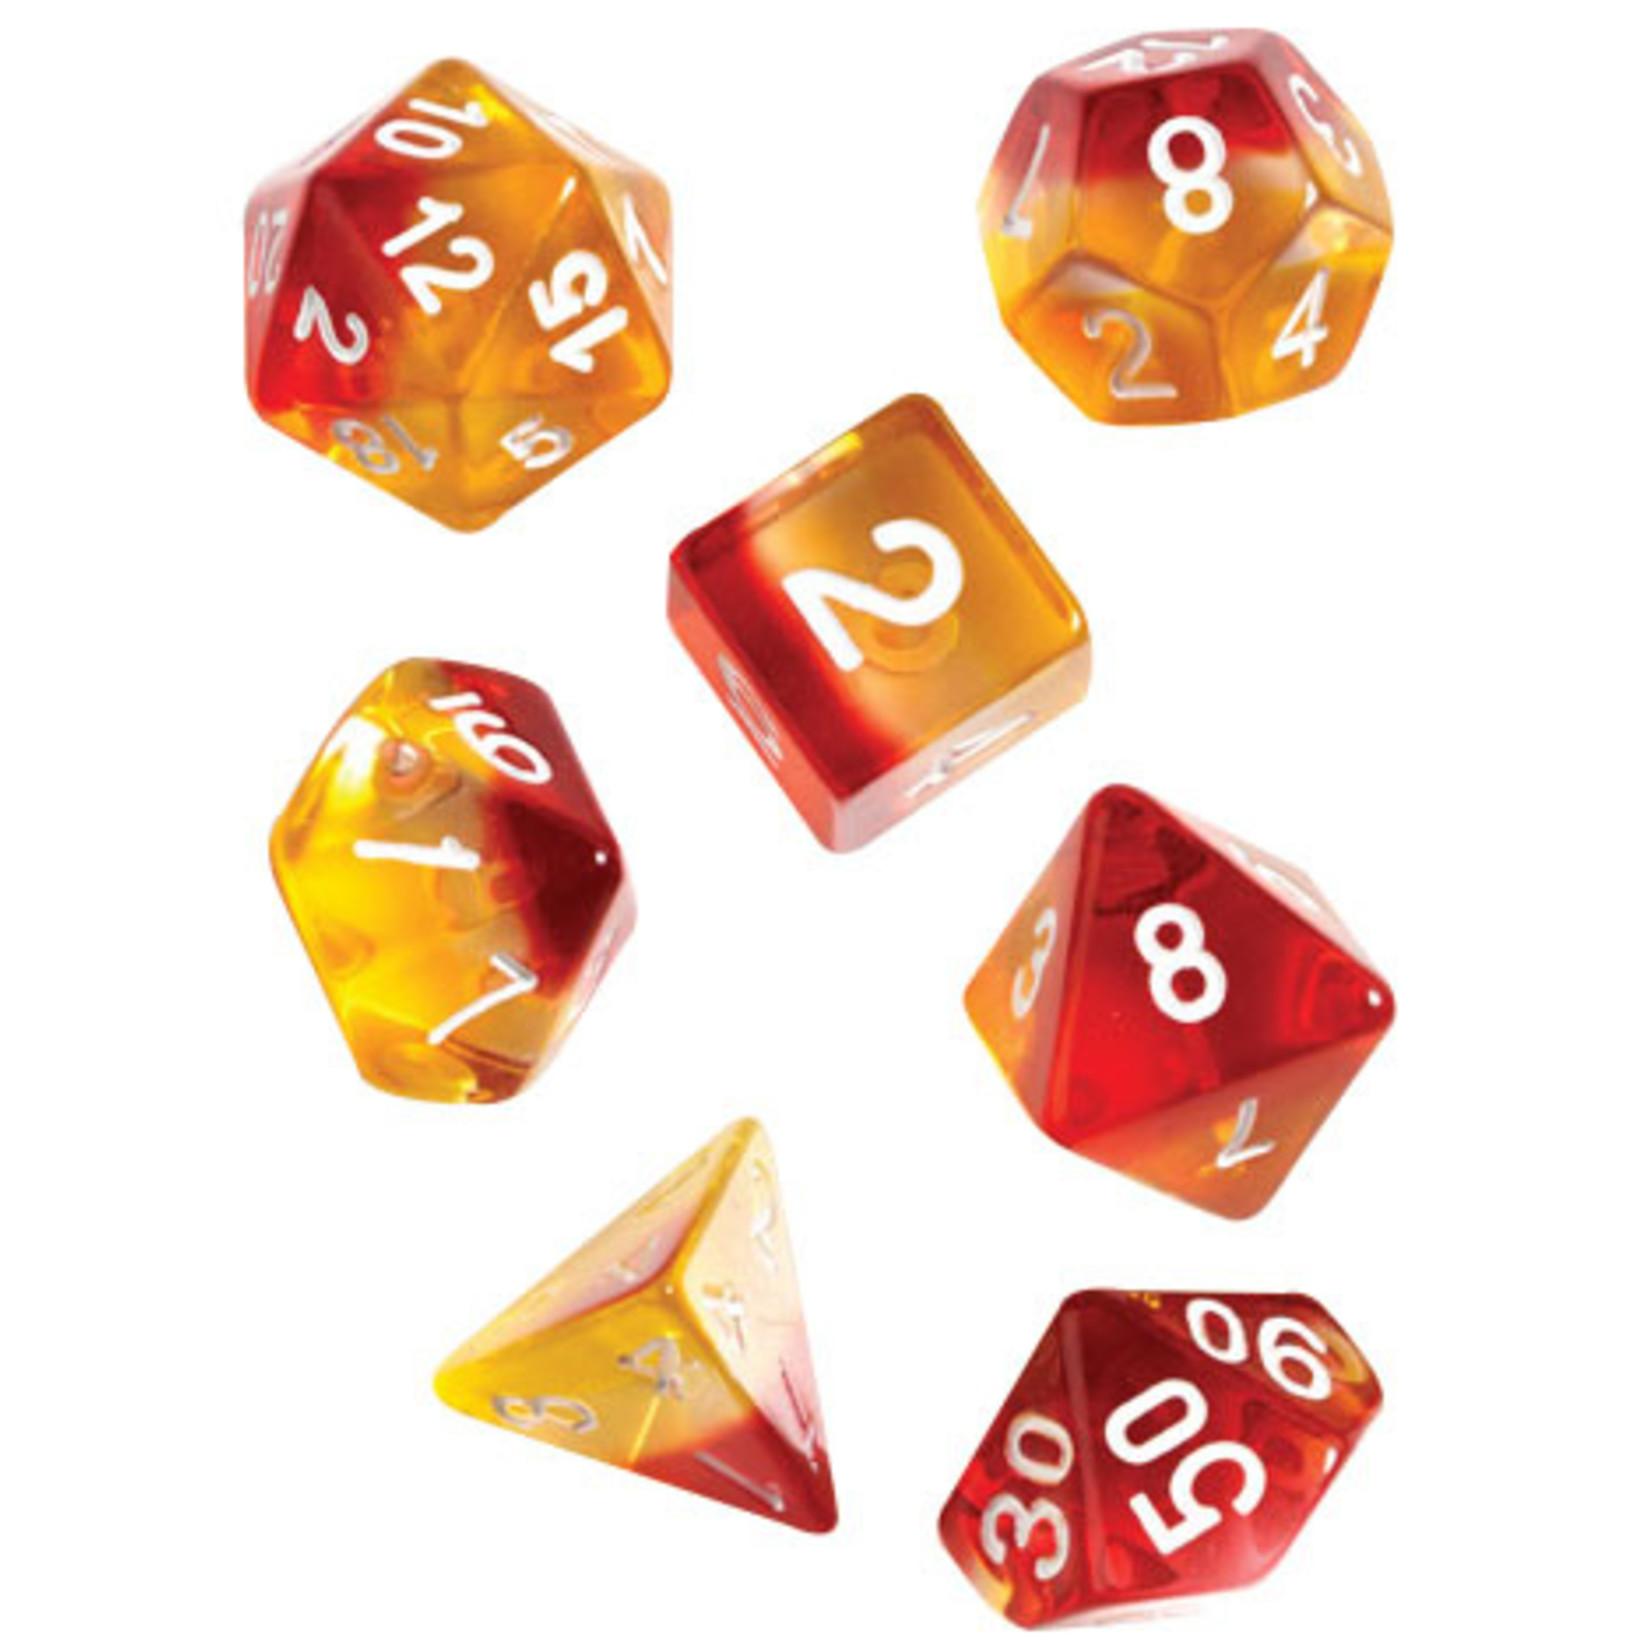 RPG Dice Set (7): Yellow, Red Translucent